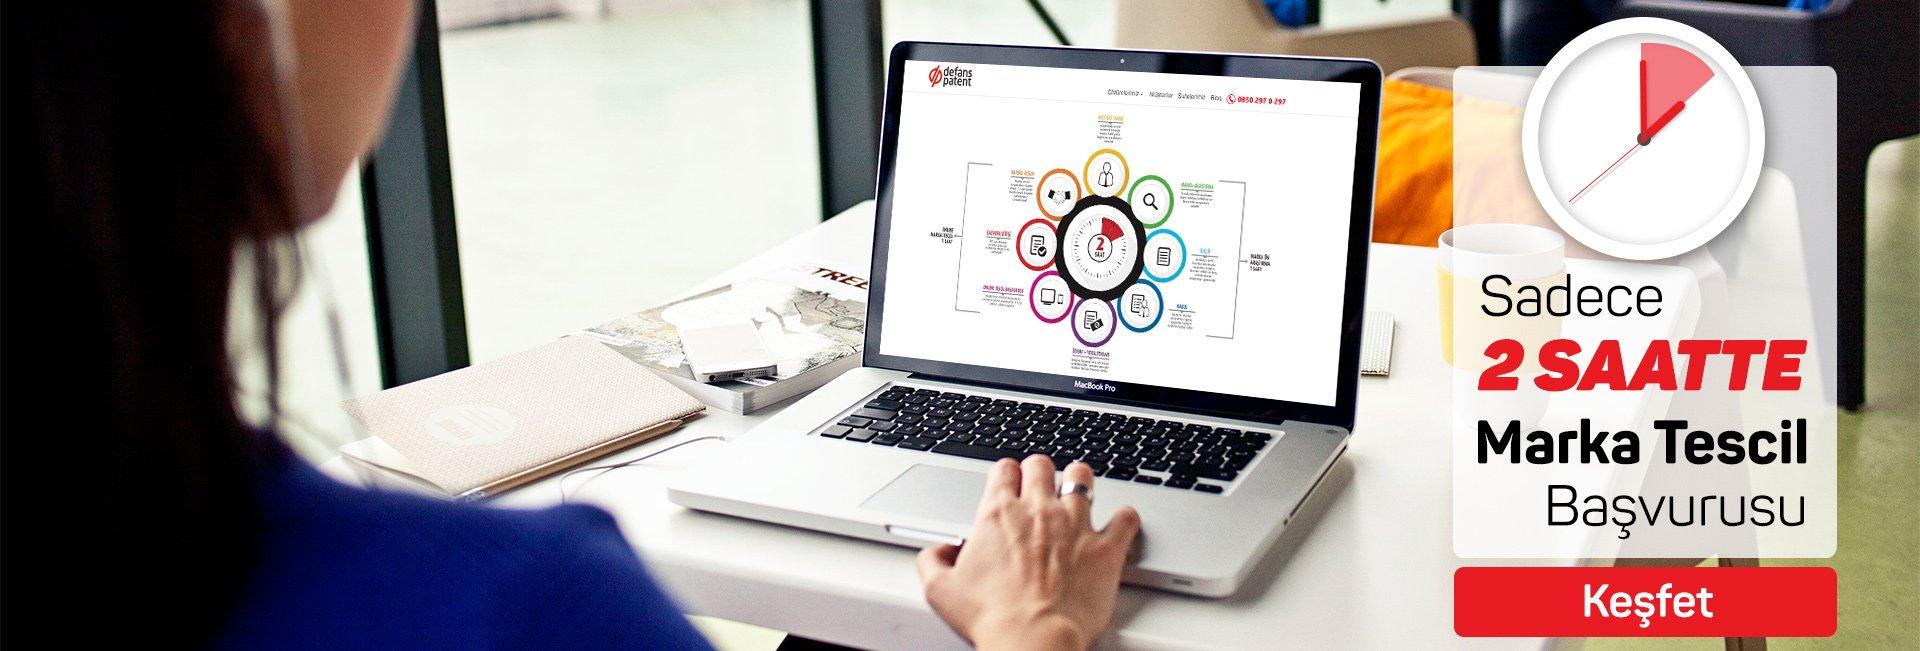 marka tescil başvurusu marka tescil - marka tescil ba  vurusu - Marka Tescil, Patent ve Tasarım Tescil – Anasayfa